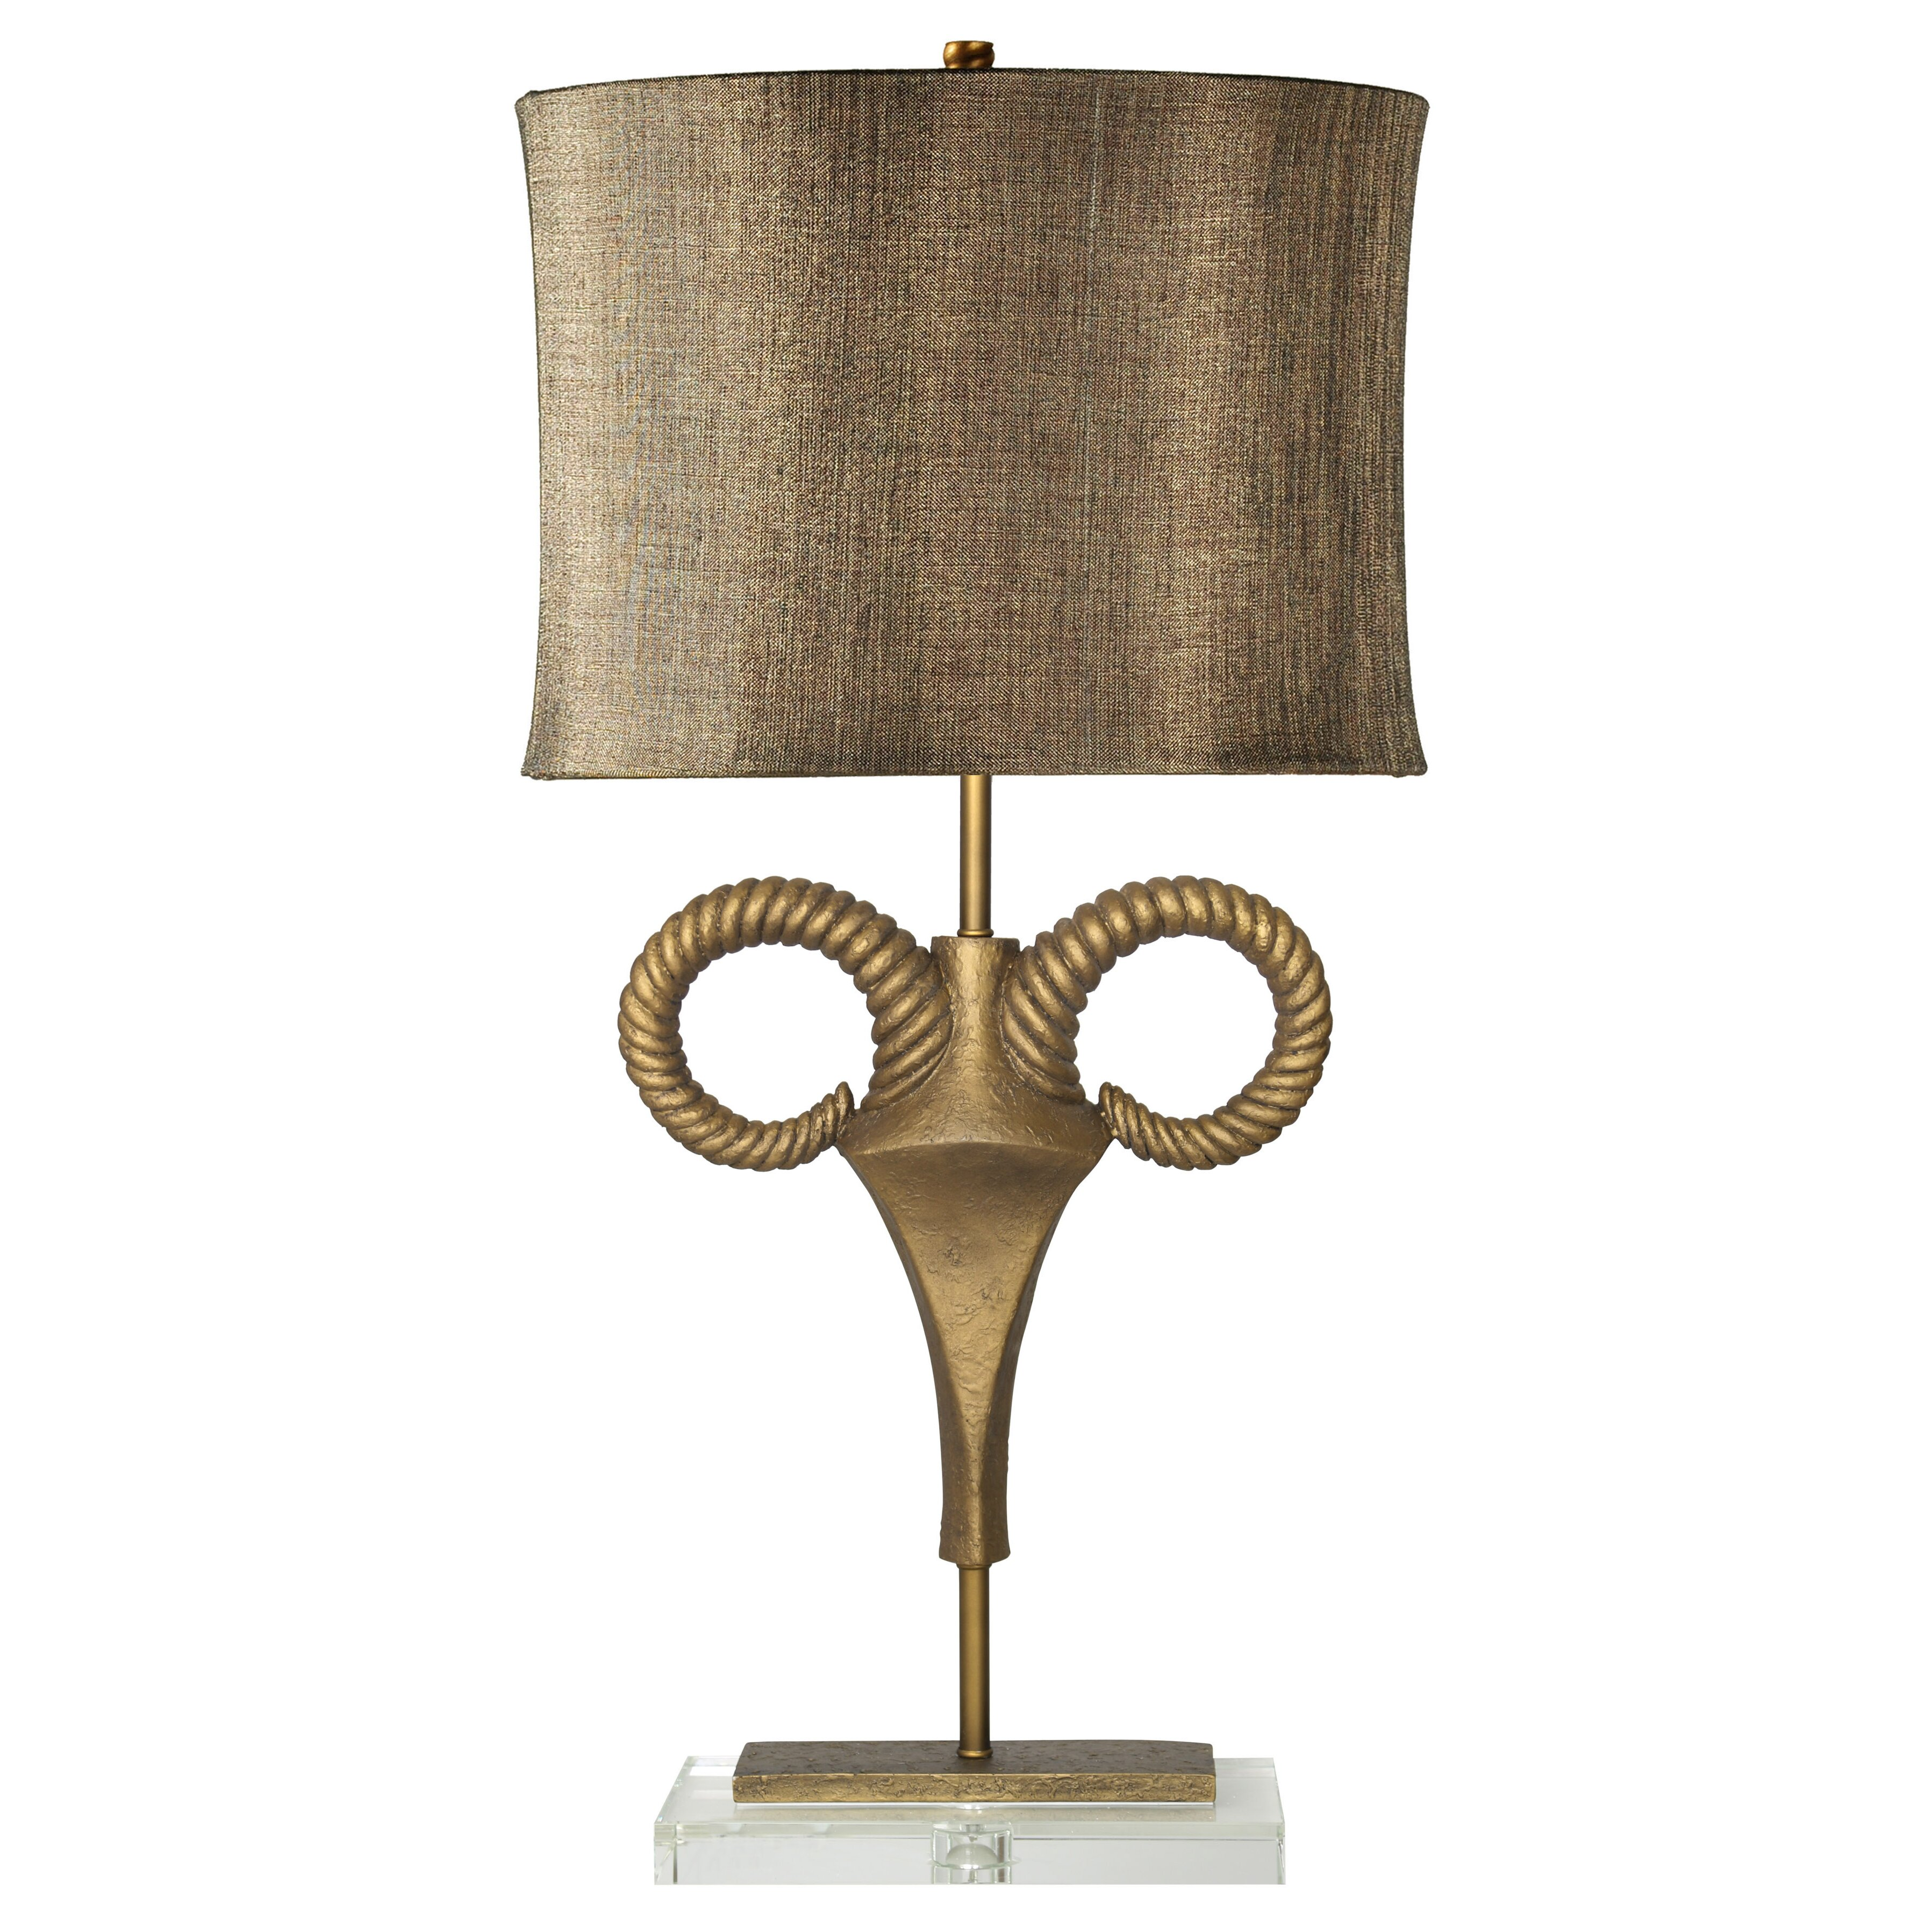 Table lamp harp sizes - Harp And Finial Nairobi 36 Table Lamp Magnifying Glass